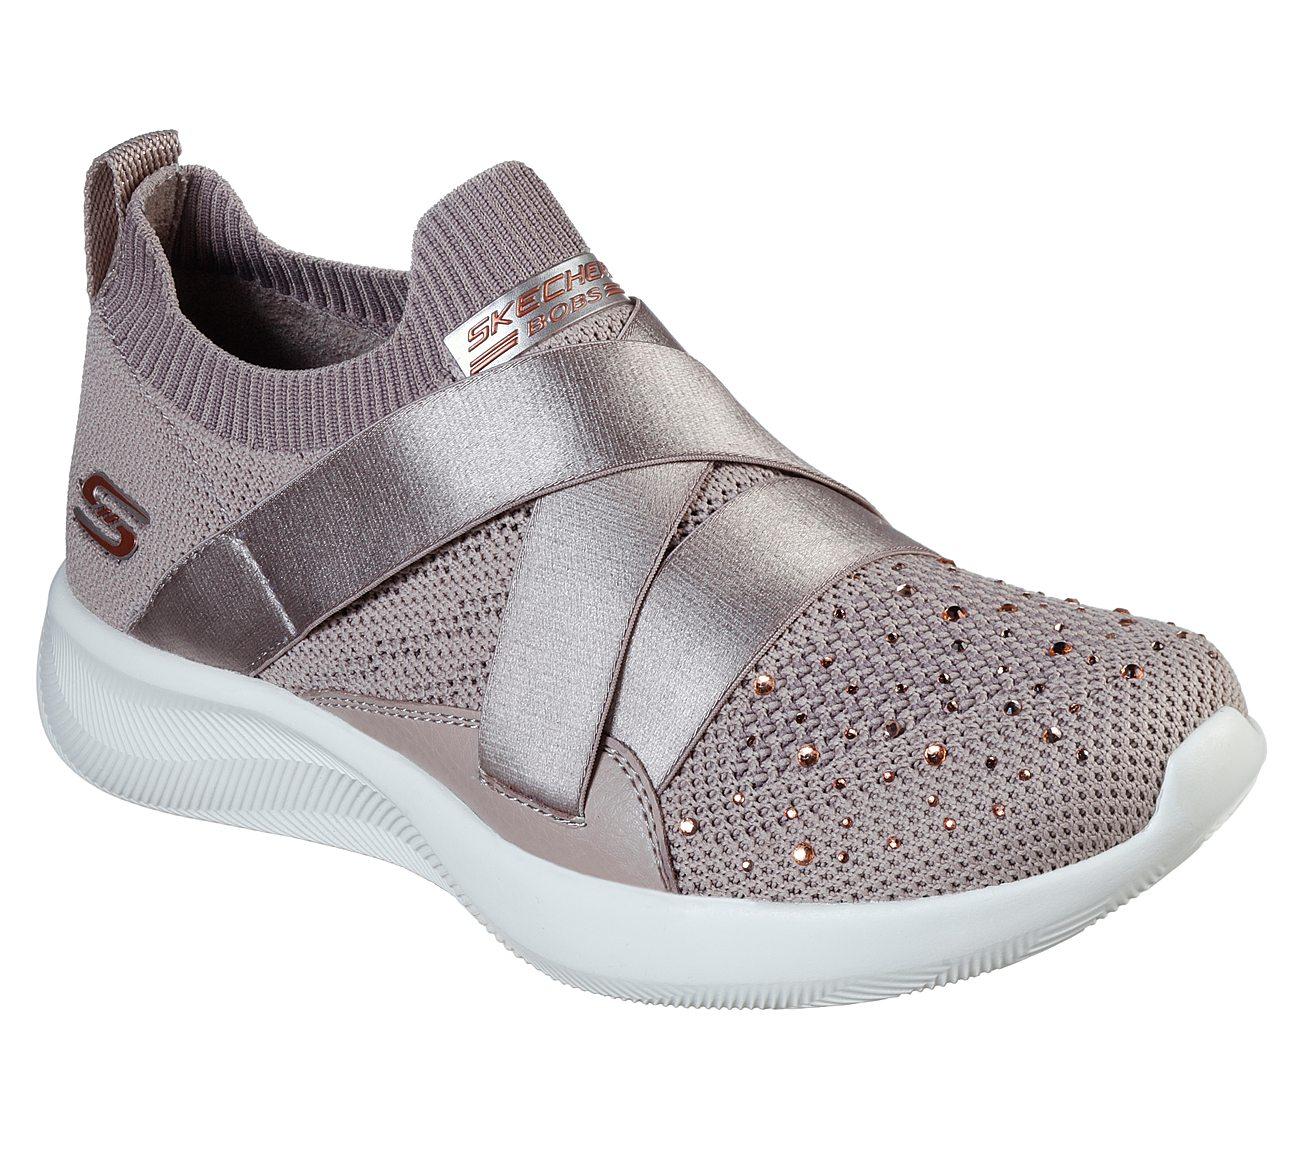 Buy SKECHERS BOBS Sport Squad 2 Winning Bobs Shoes